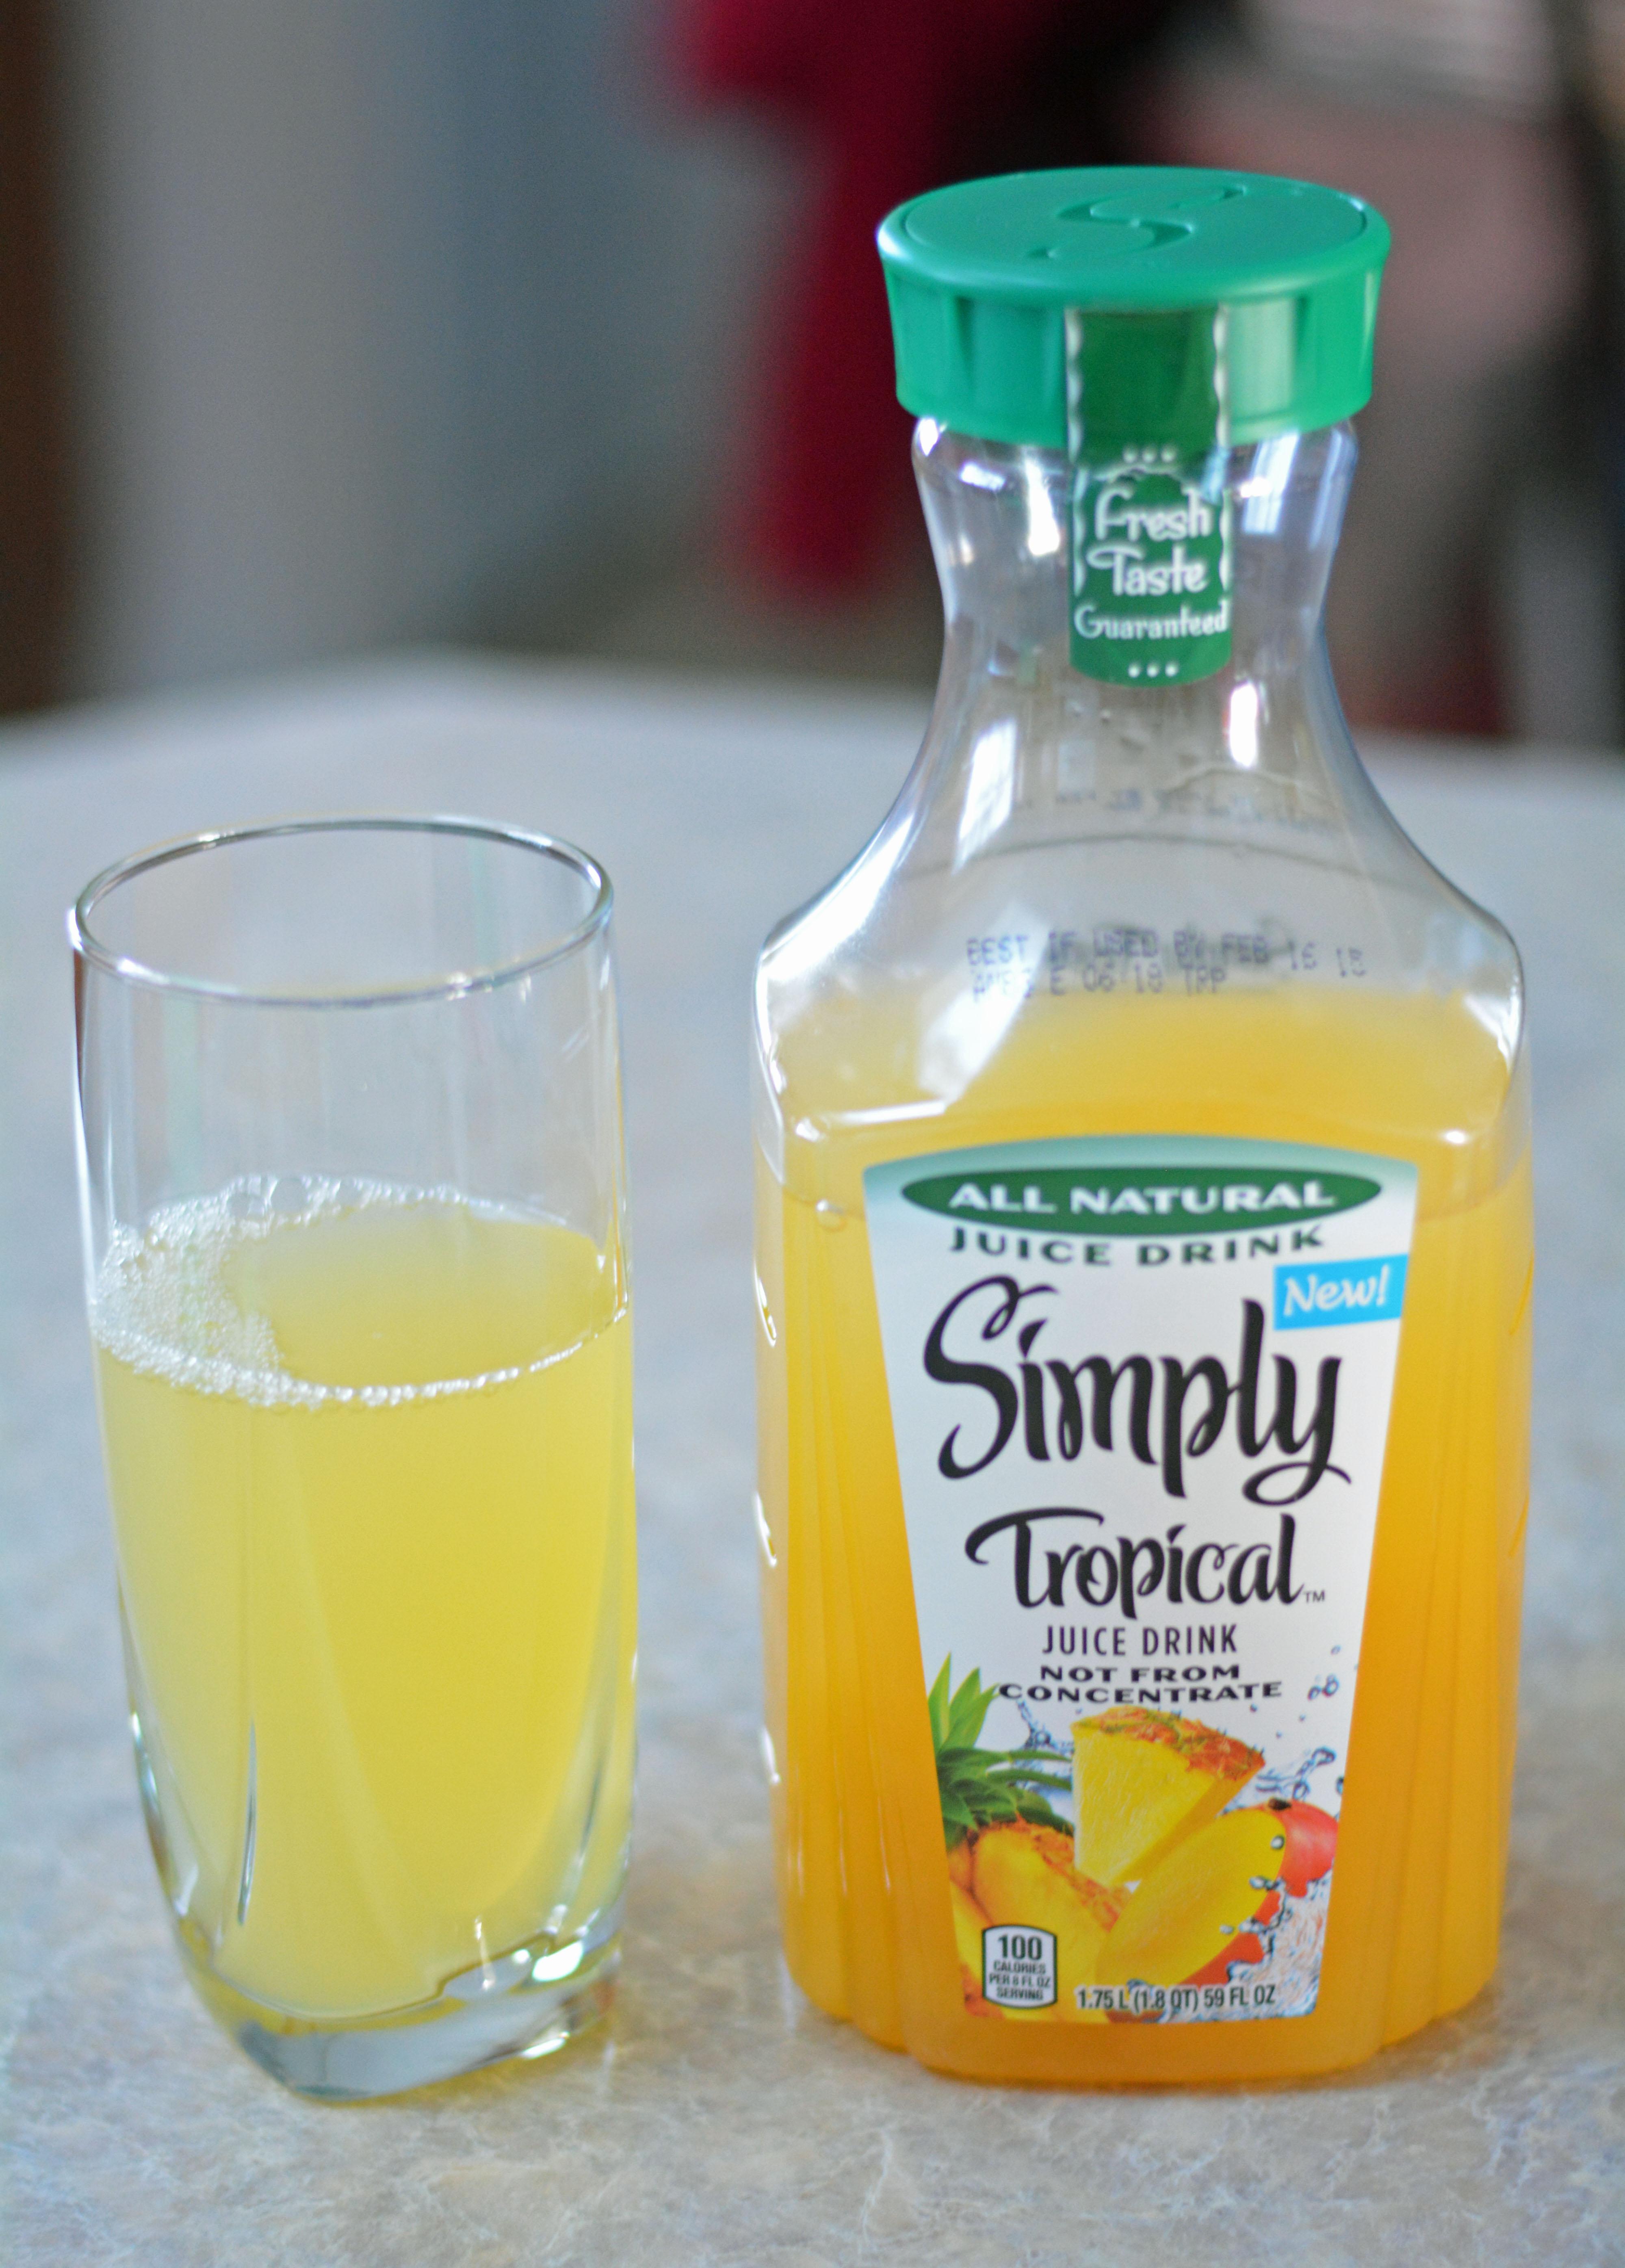 drinks beverage juice - photo #16